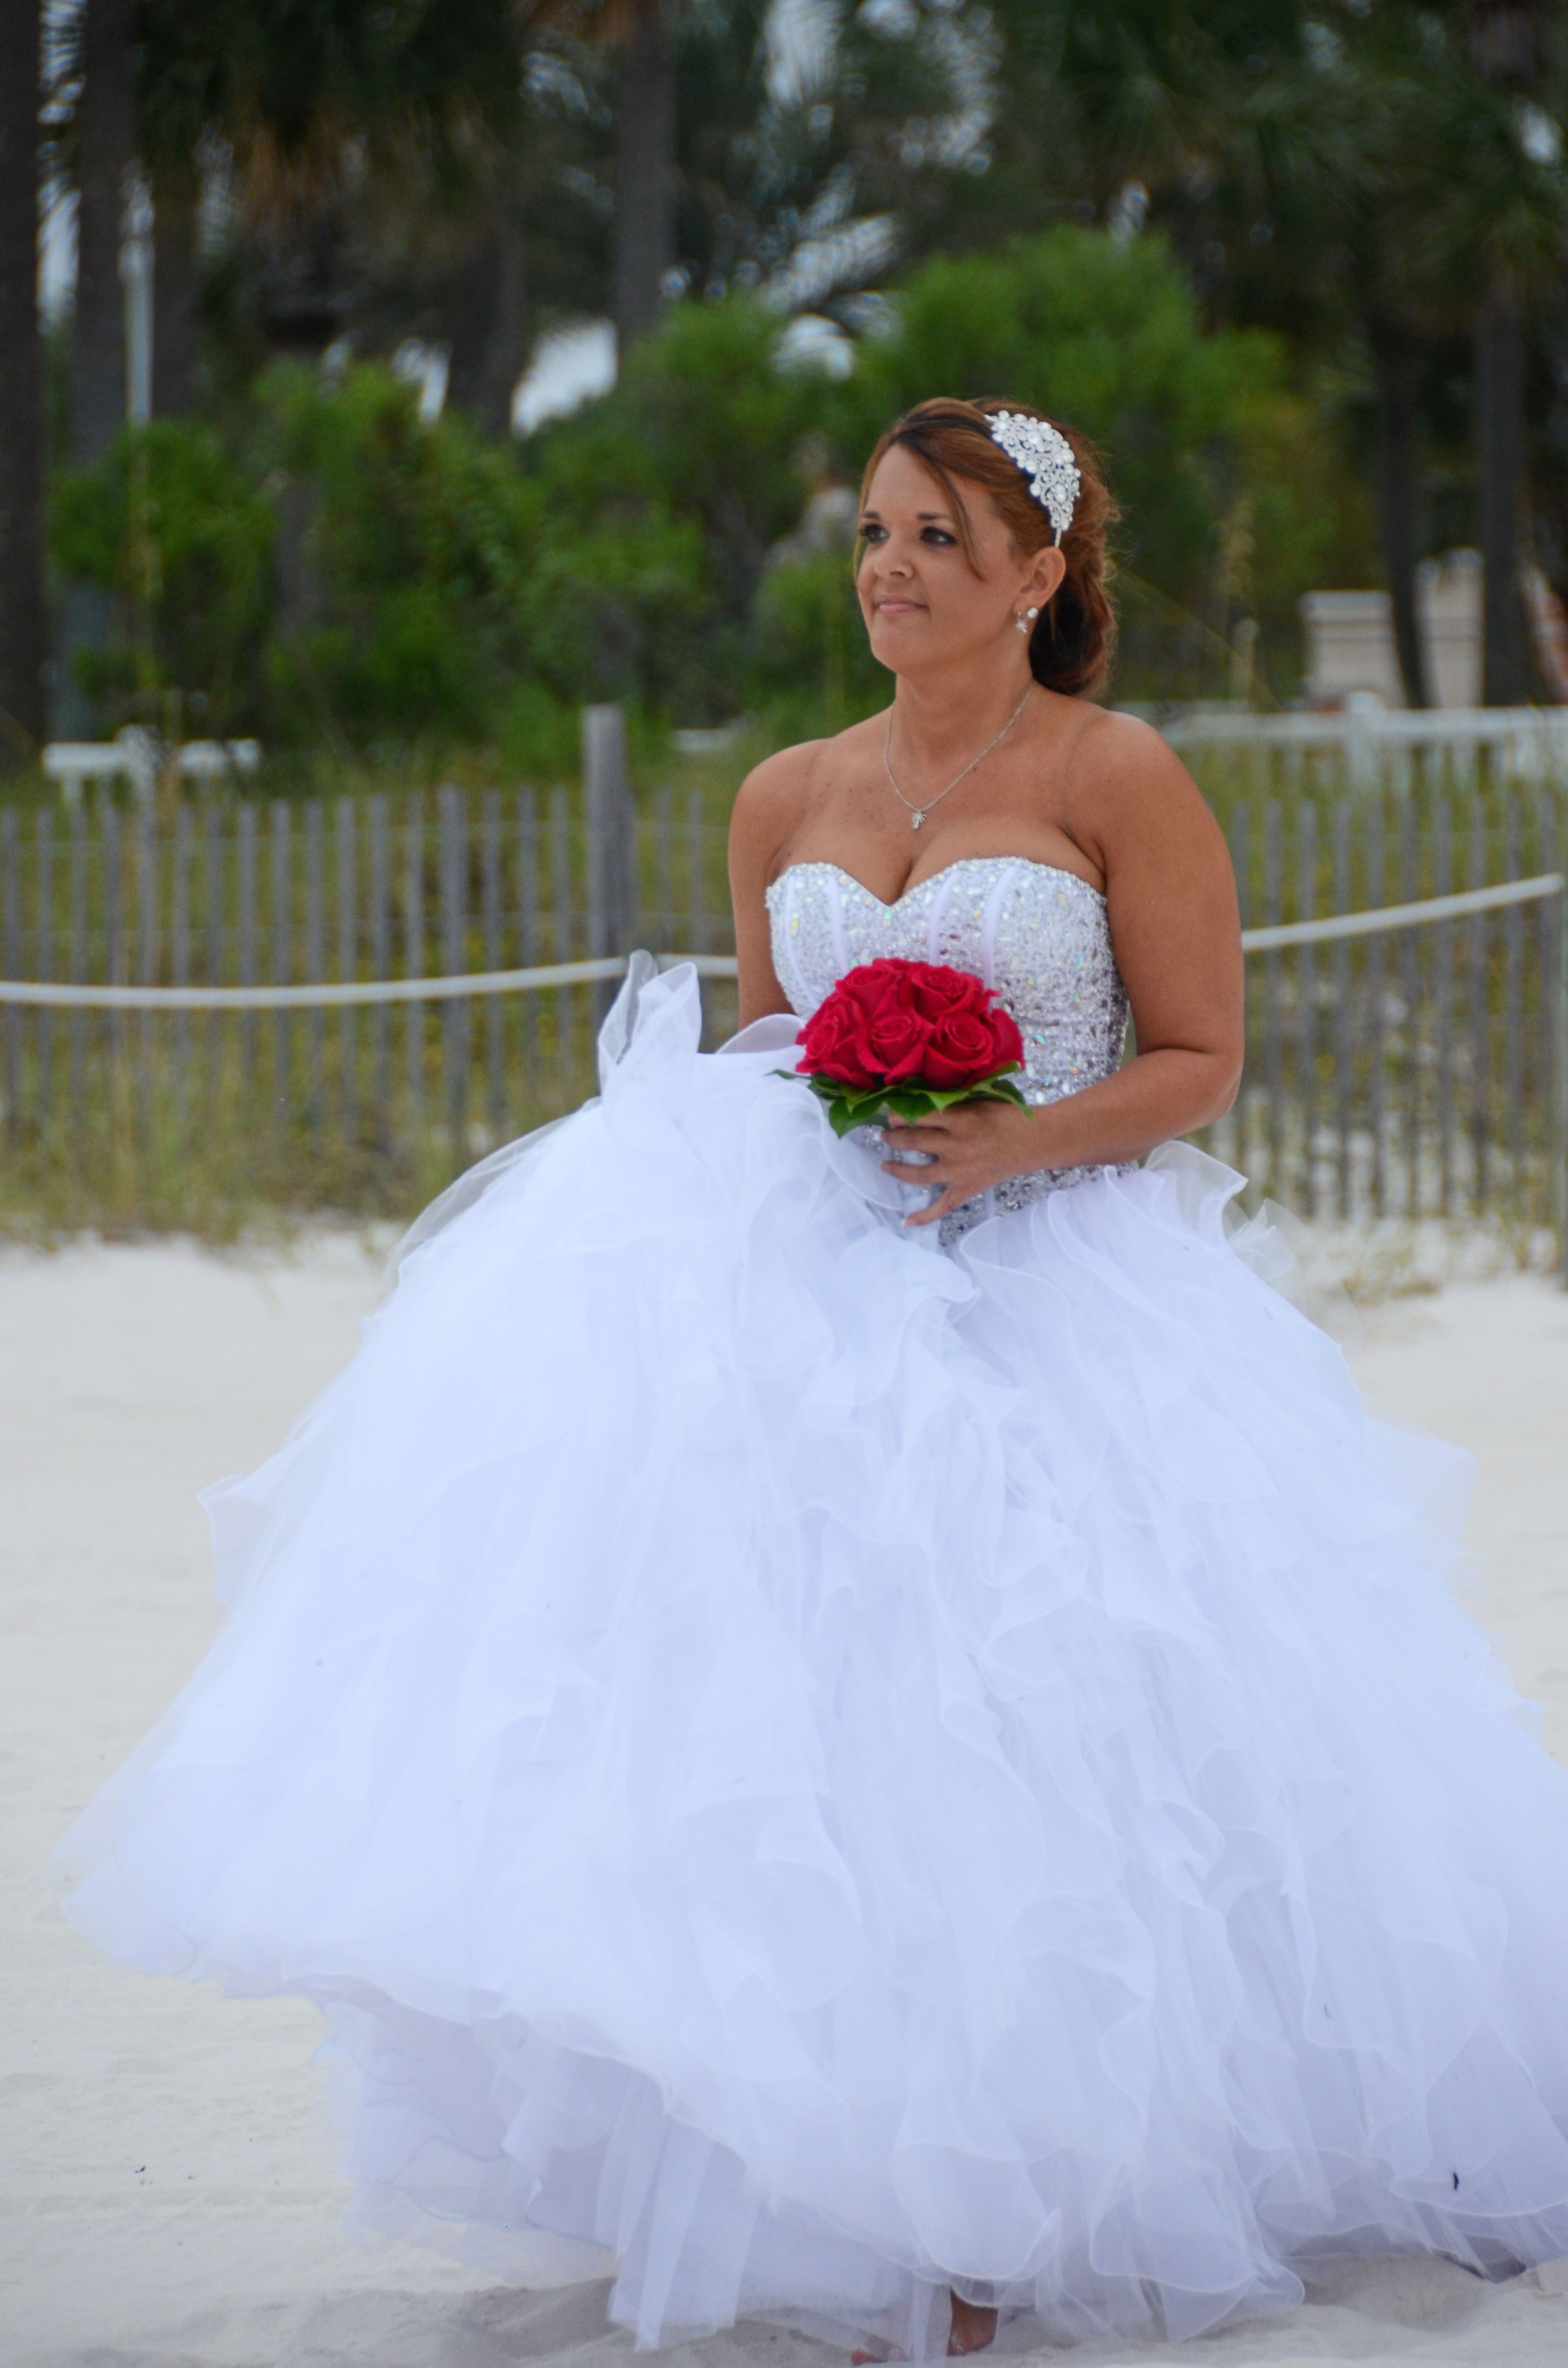 Panama City Beach, Florida beach wedding bride's entrance